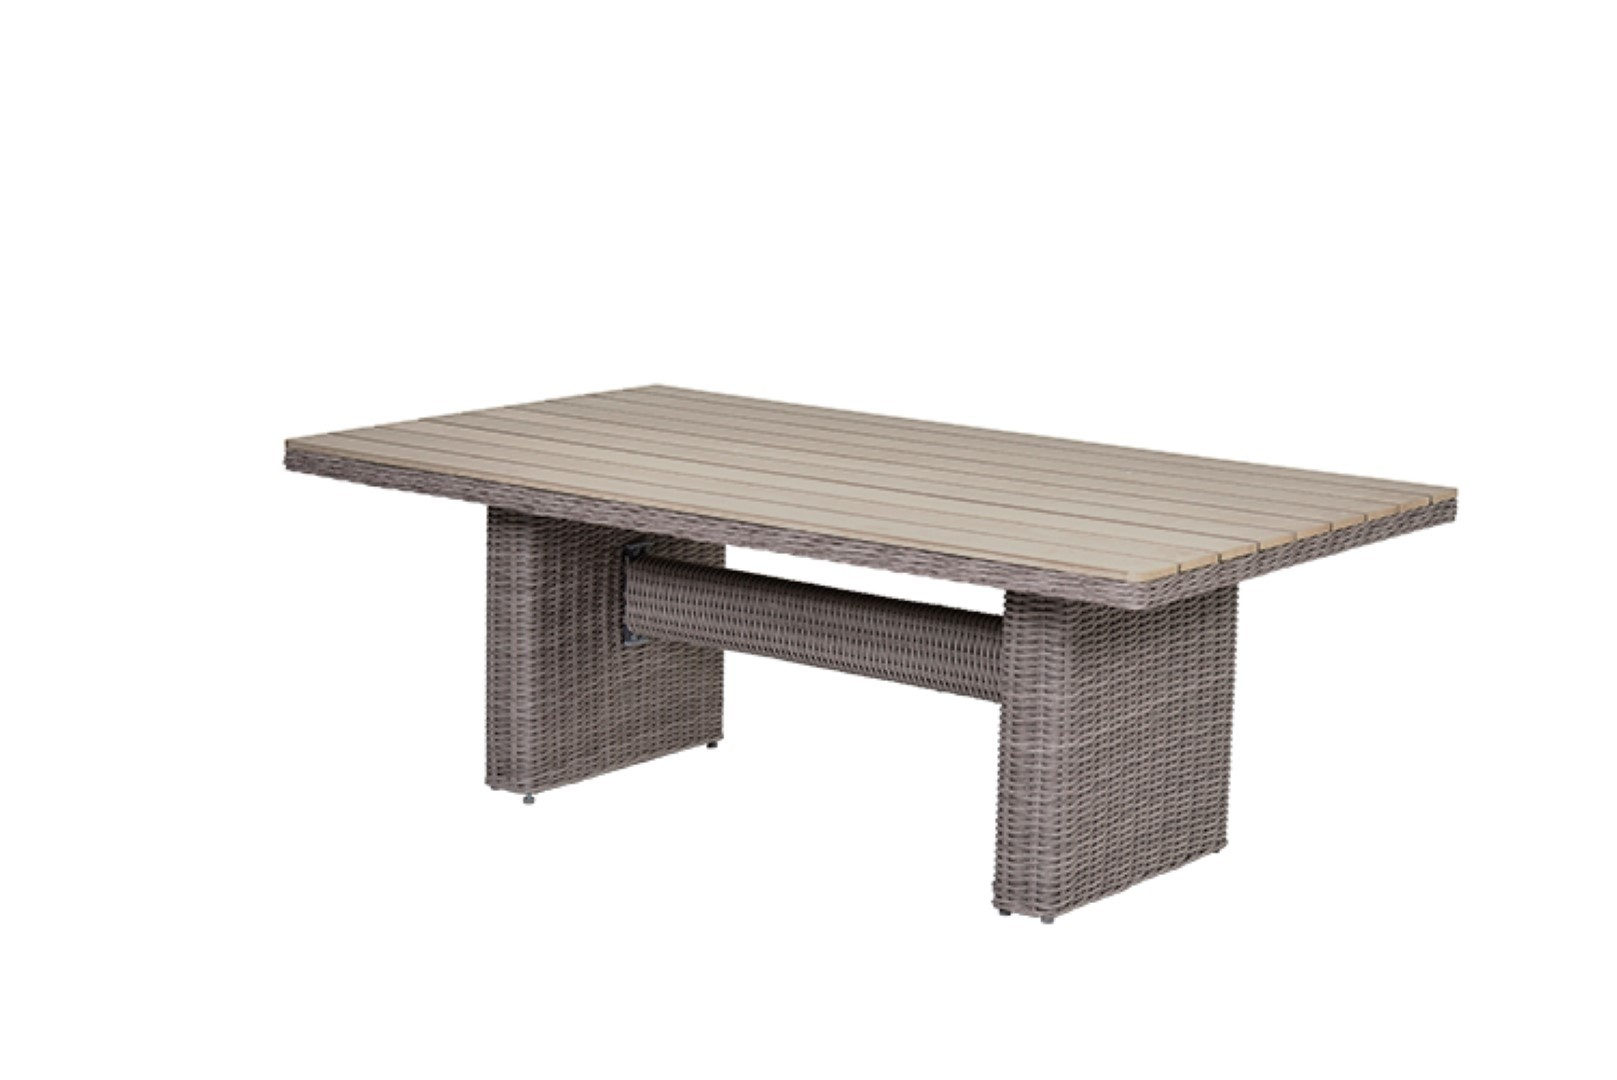 Tennessee Lounge dining tafel 180x100 cm organic grey 5 mm sand polywood